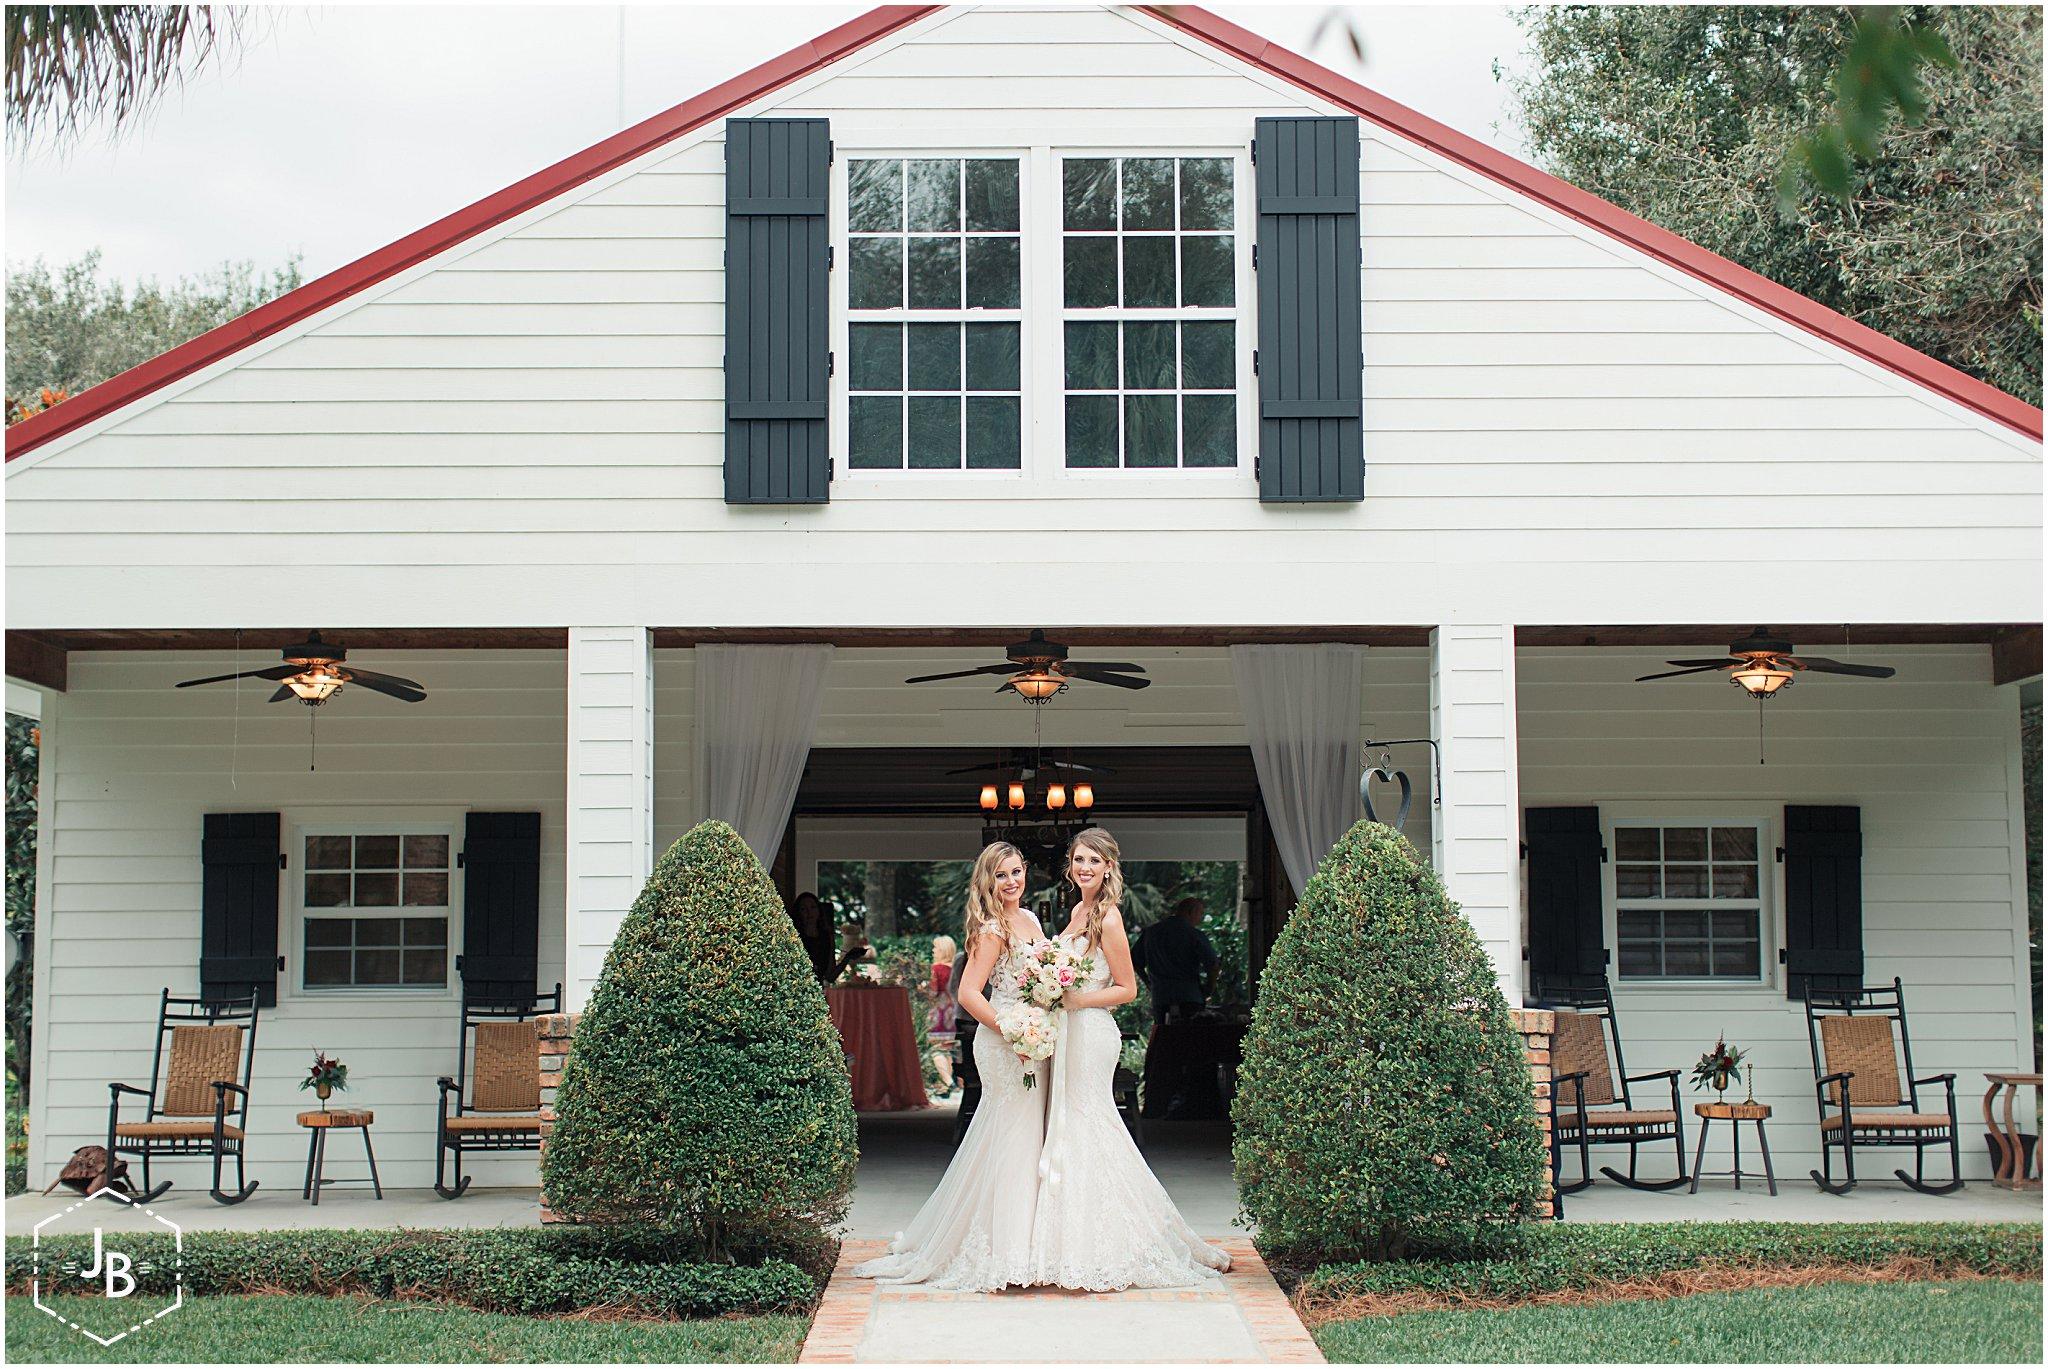 WeddingandEngagementFloridaPhotographer_0447.jpg